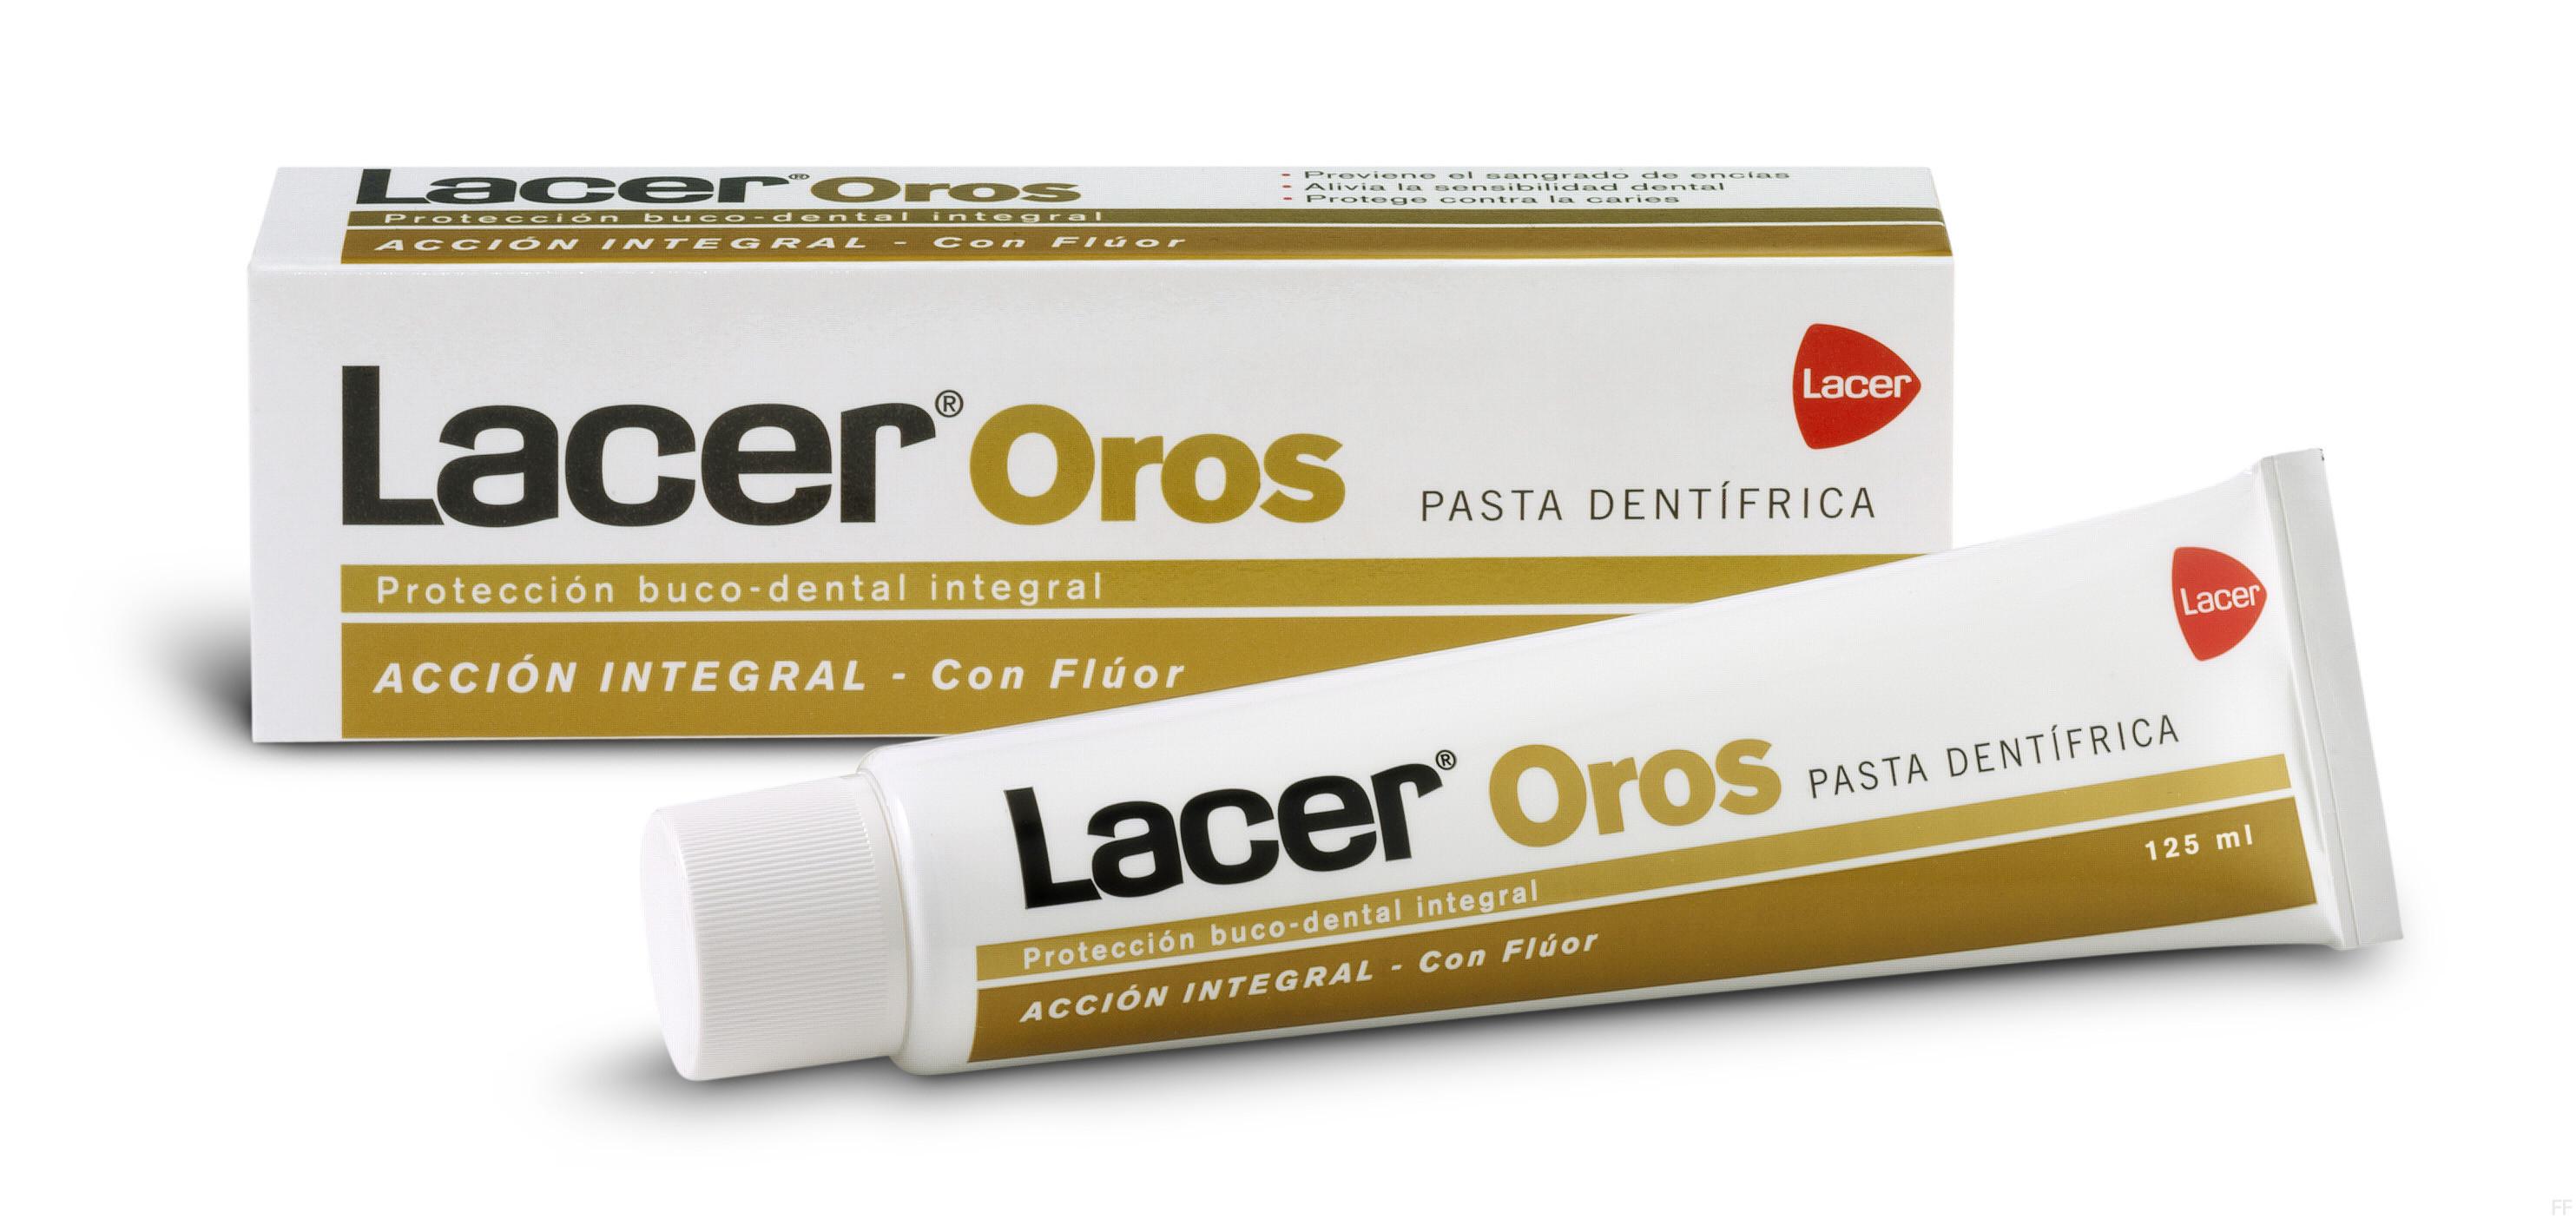 Comprar Lacer Oros Pasta Dentífrica 125 ml online. Envío gratis.